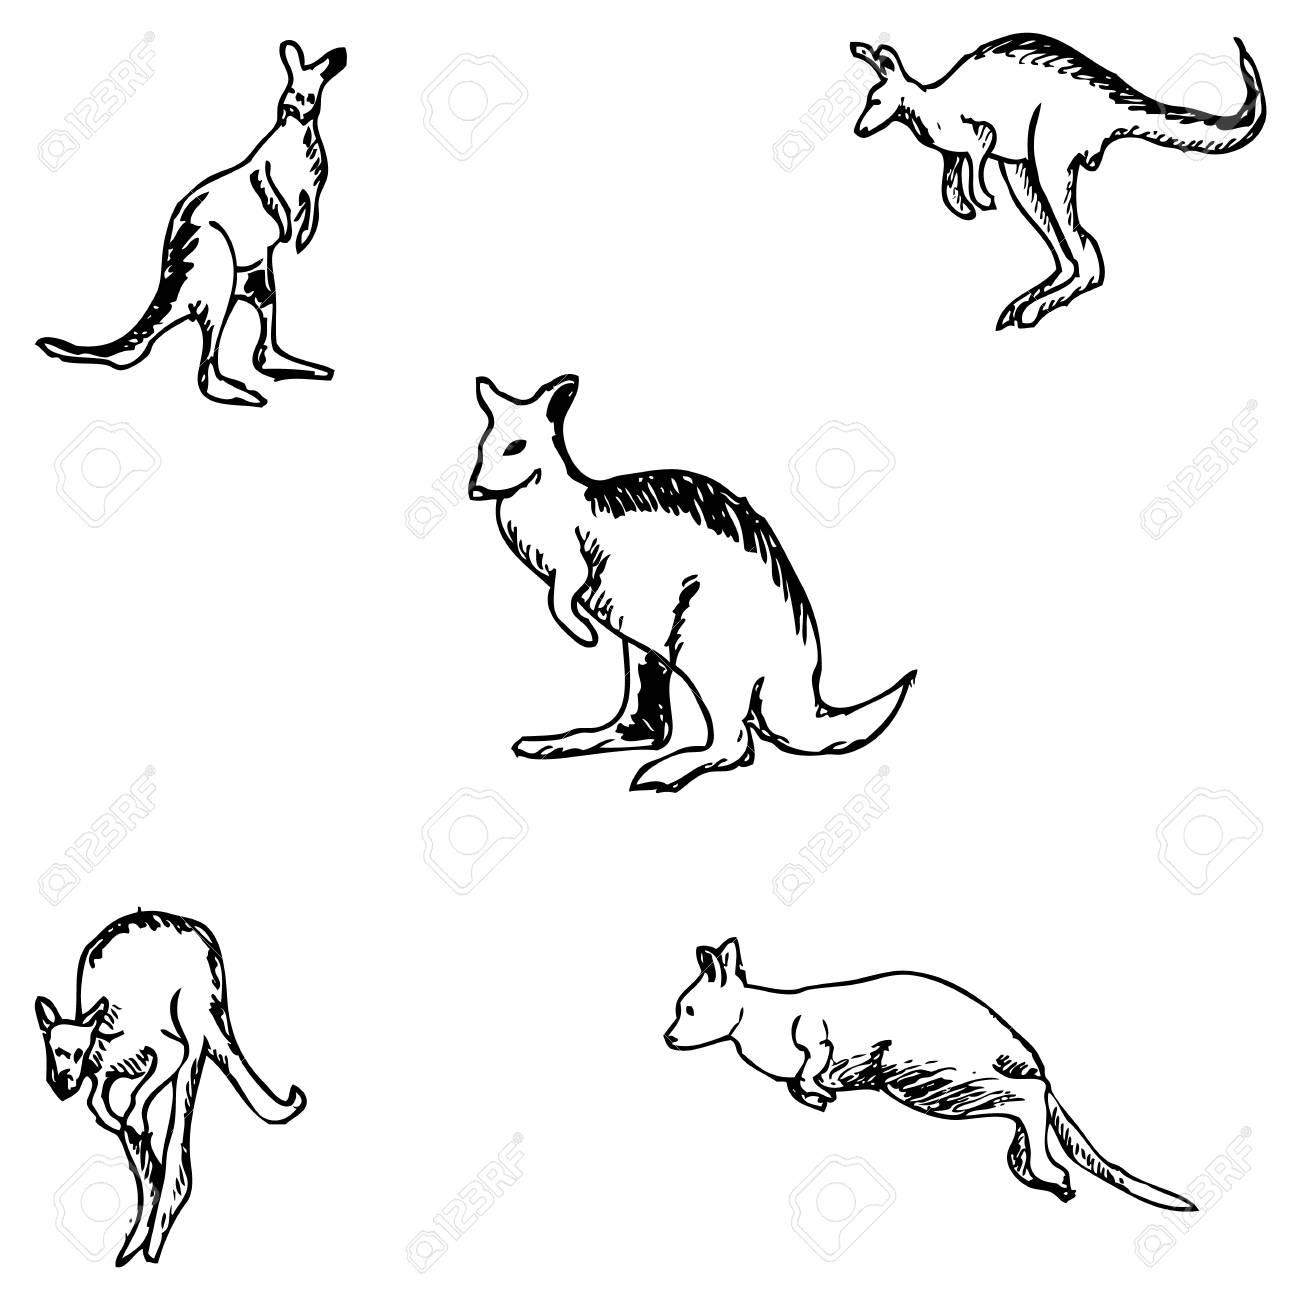 Kangaroo a sketch by hand pencil drawing vector image stock vector 67876107